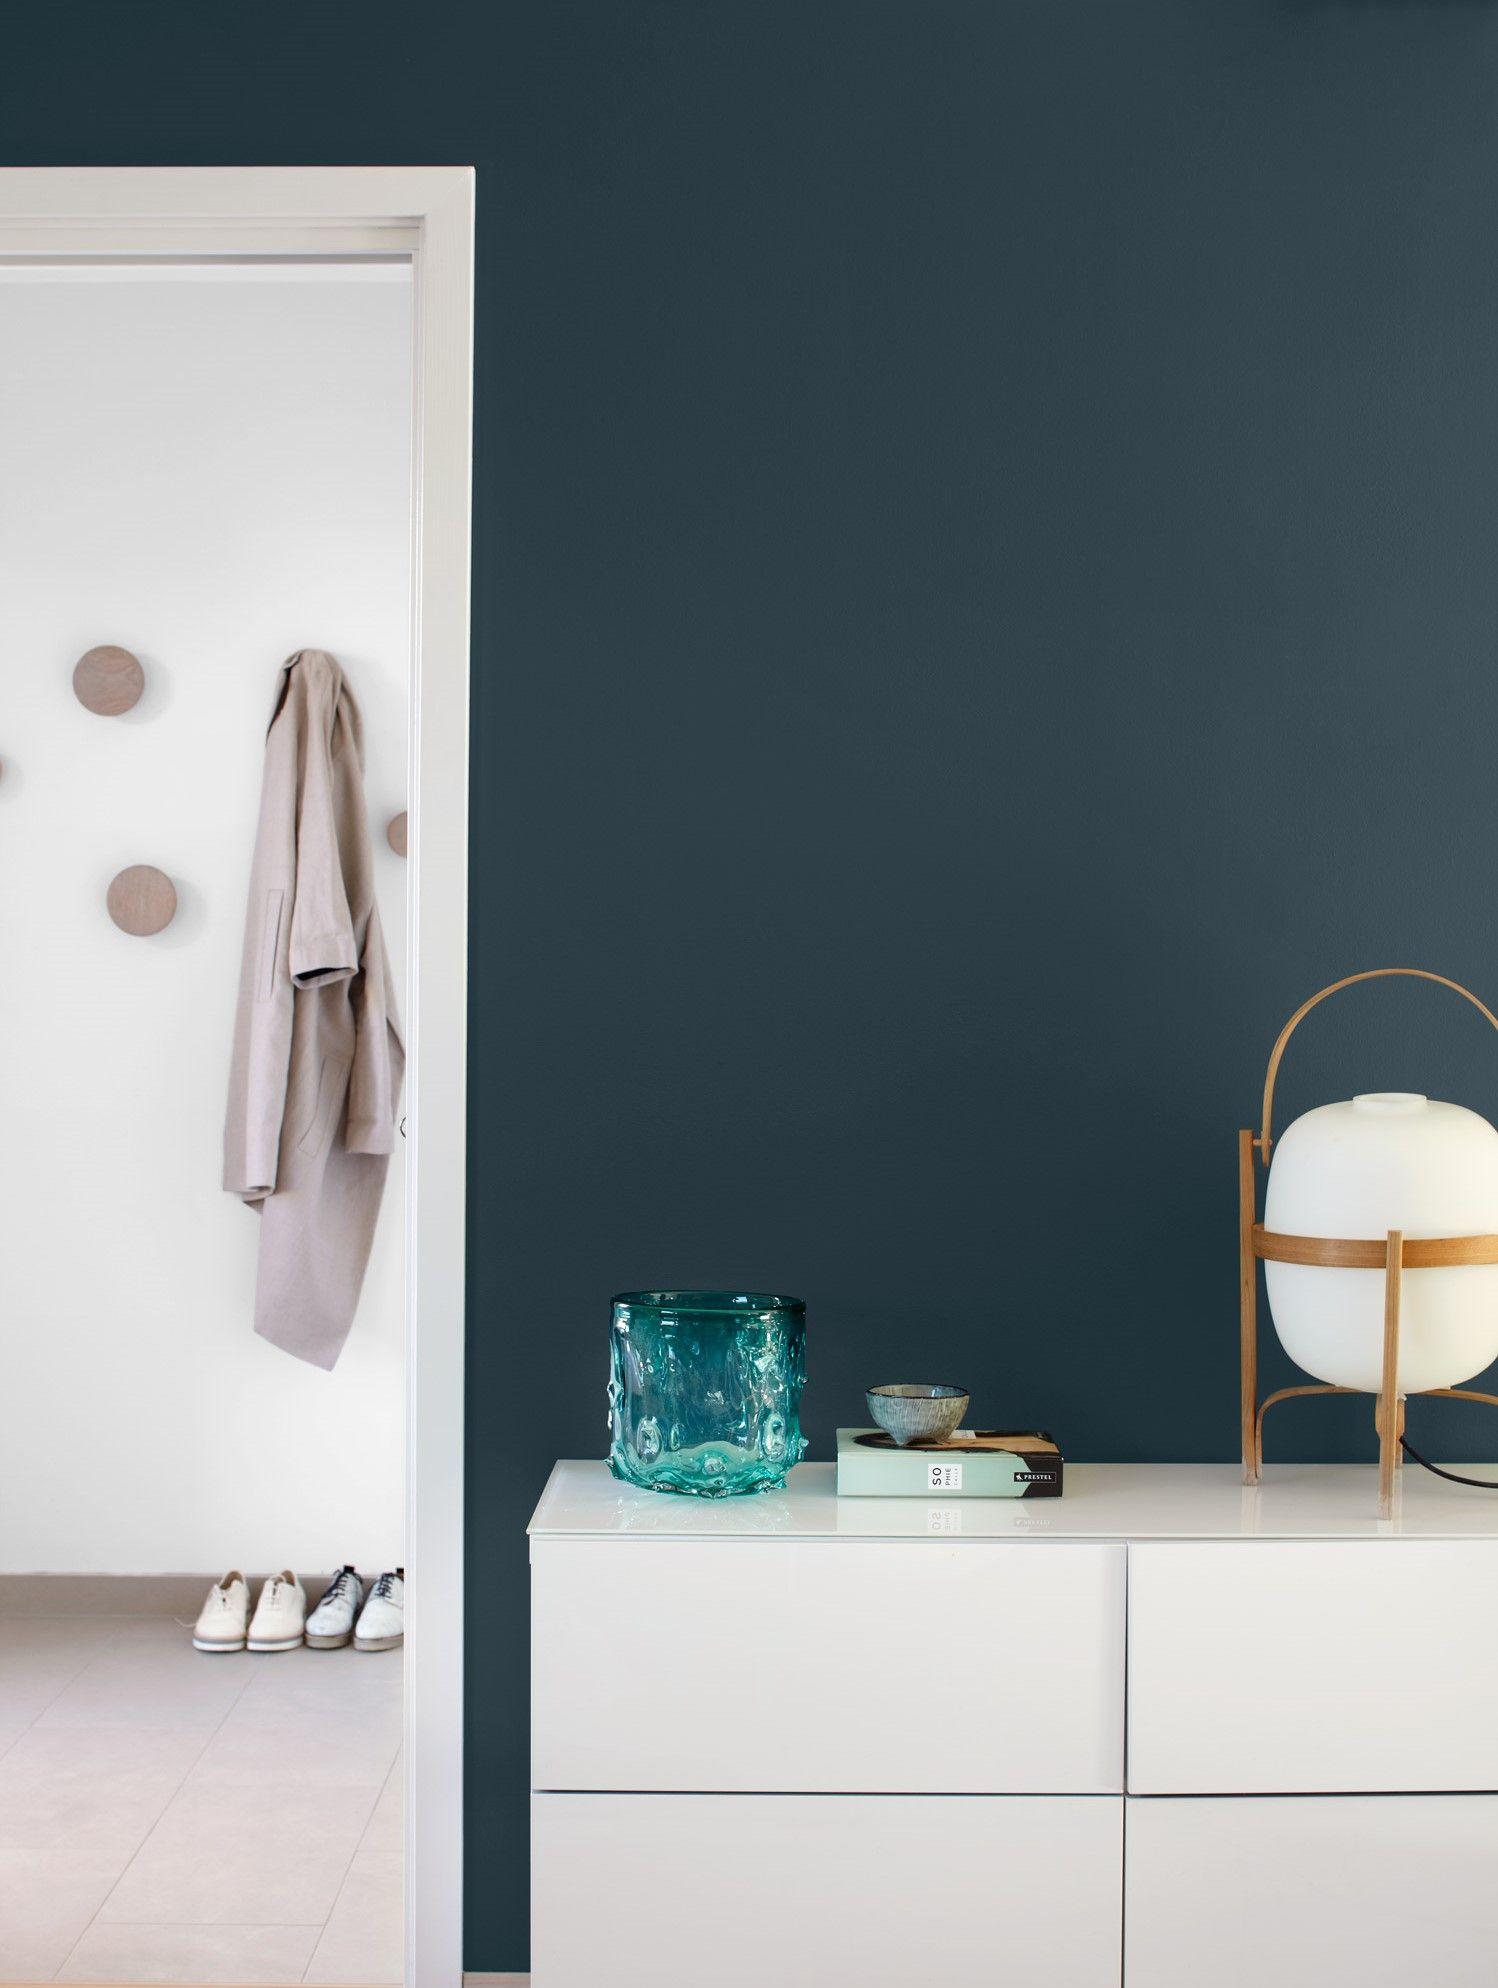 5180 Oslo | soft touches | Soverom jotun, Soverom dekor og